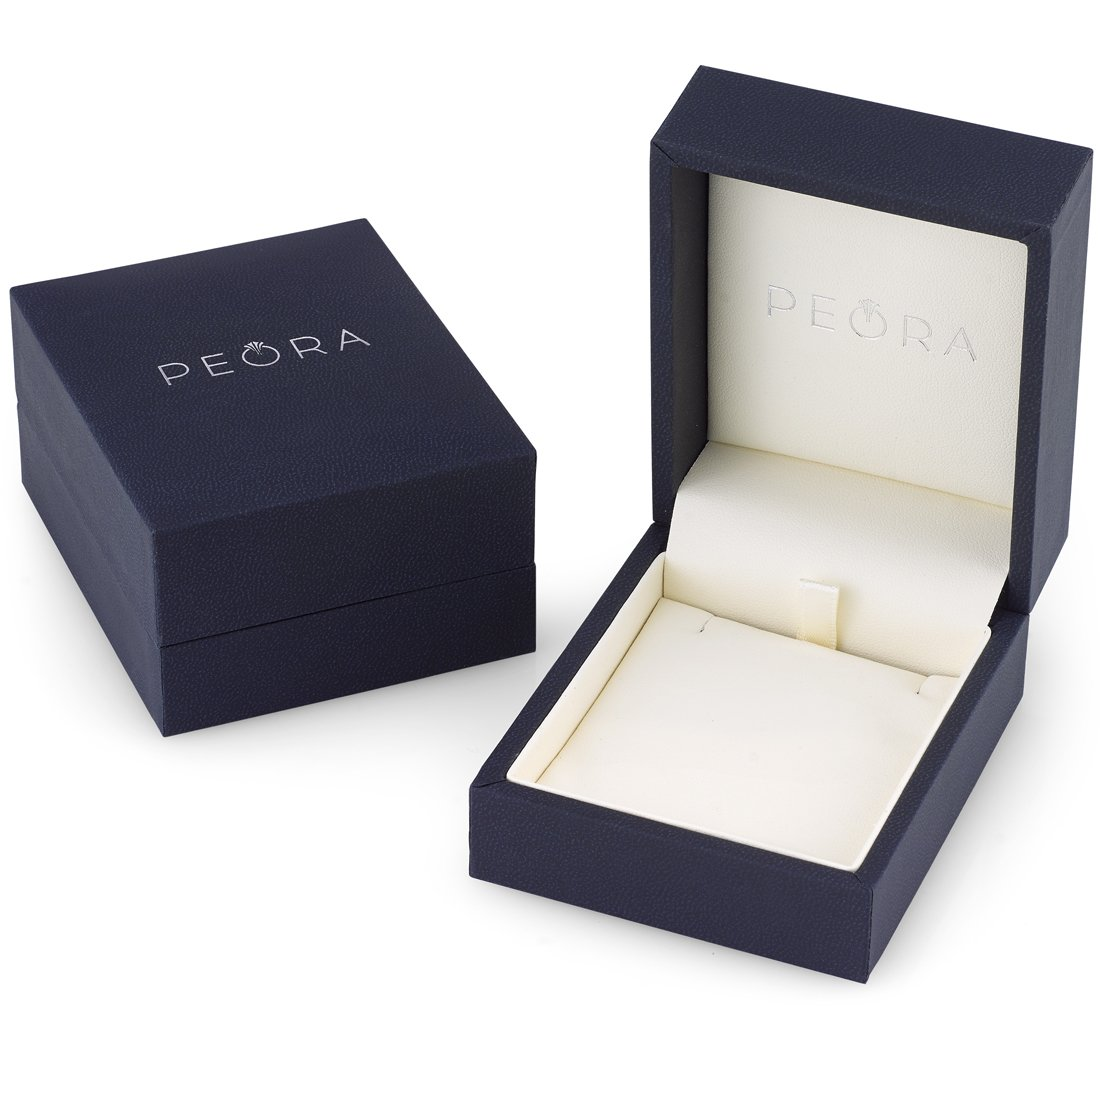 14 Karat White Gold Oval Shape 3.00 Carats London Blue Topaz Diamond Pendant by Peora (Image #4)